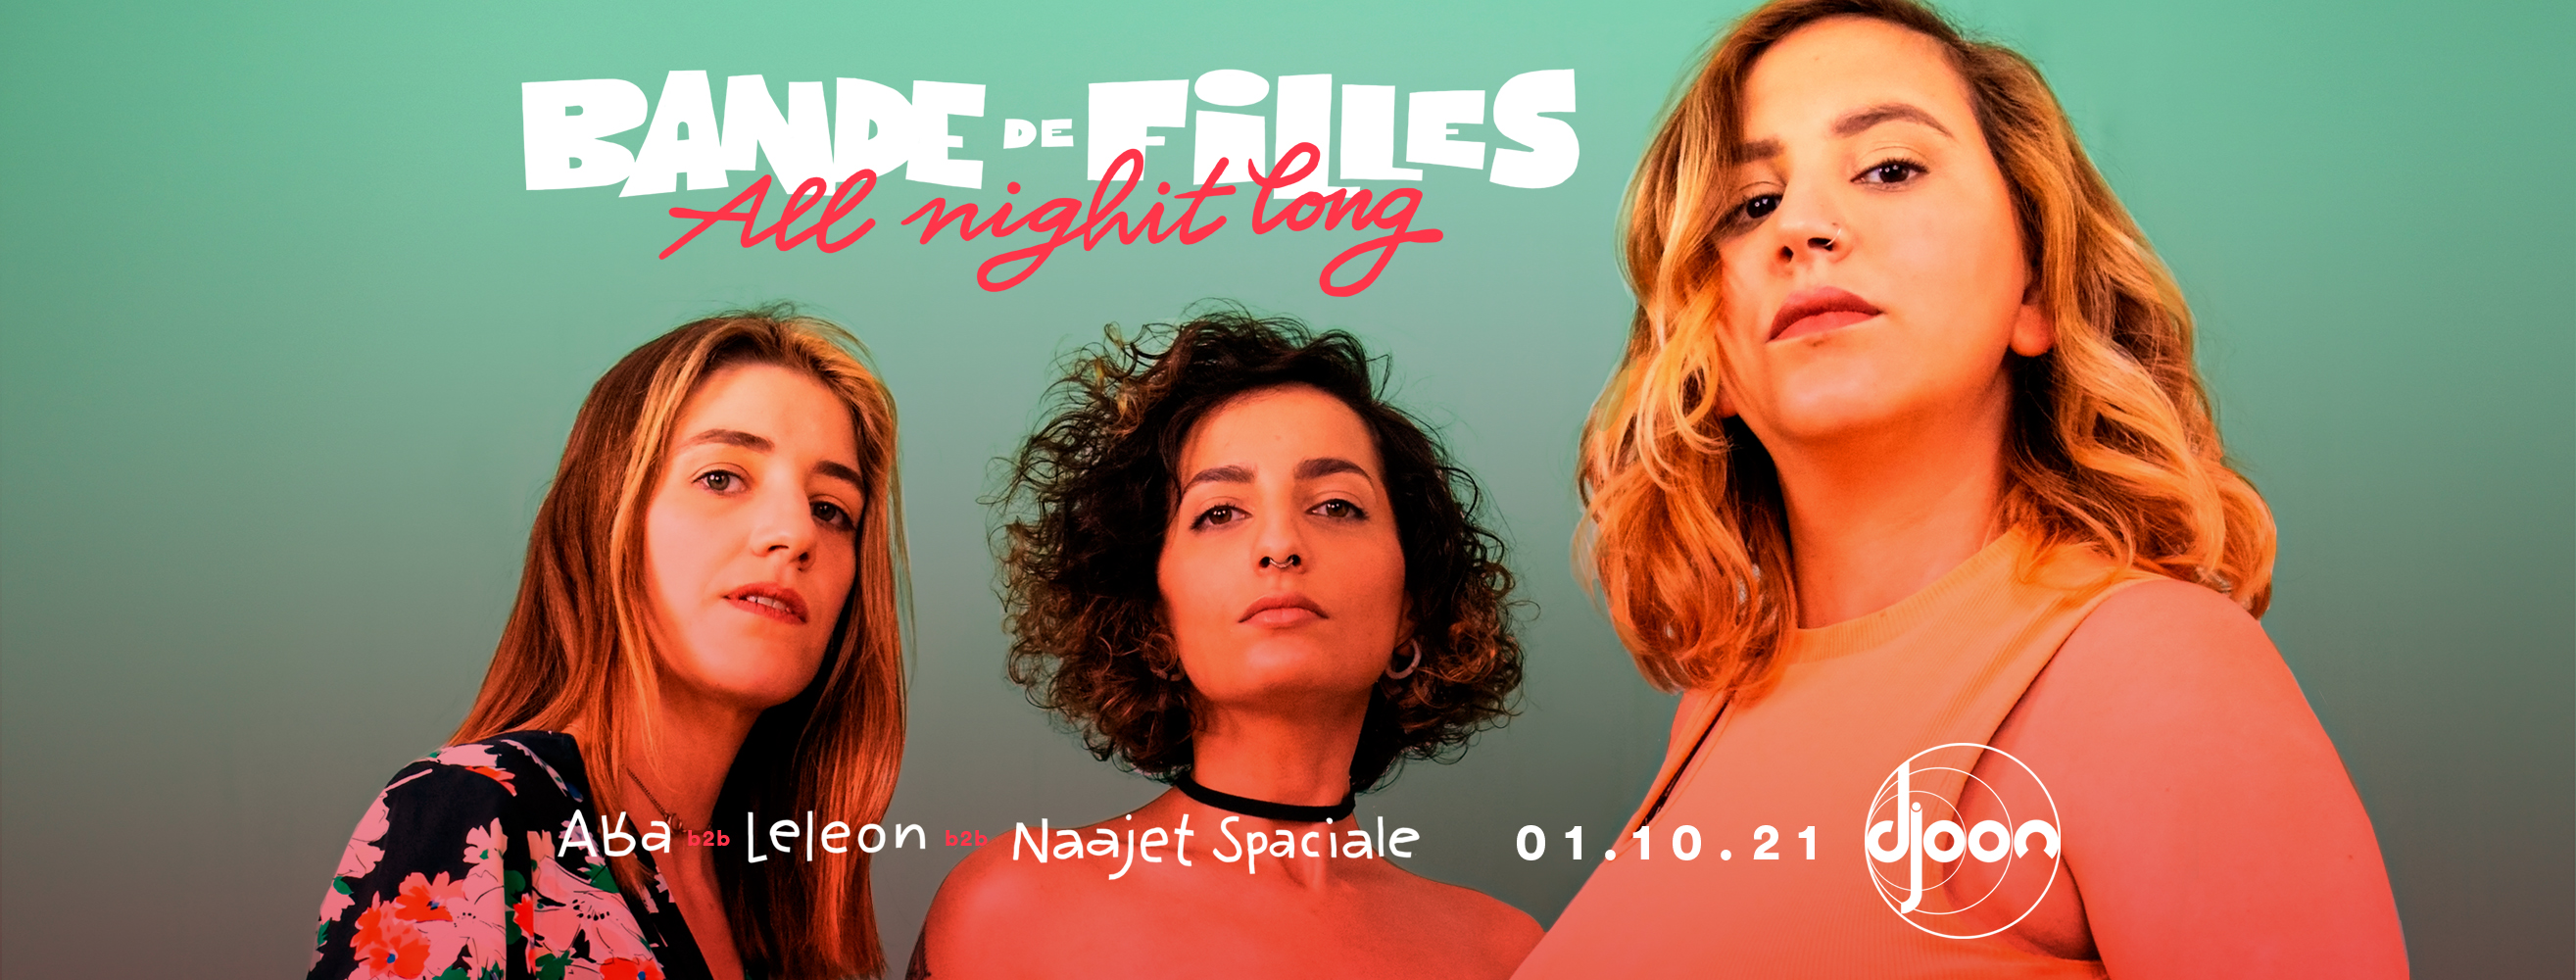 Djoon: Bande de Filles (all night long)